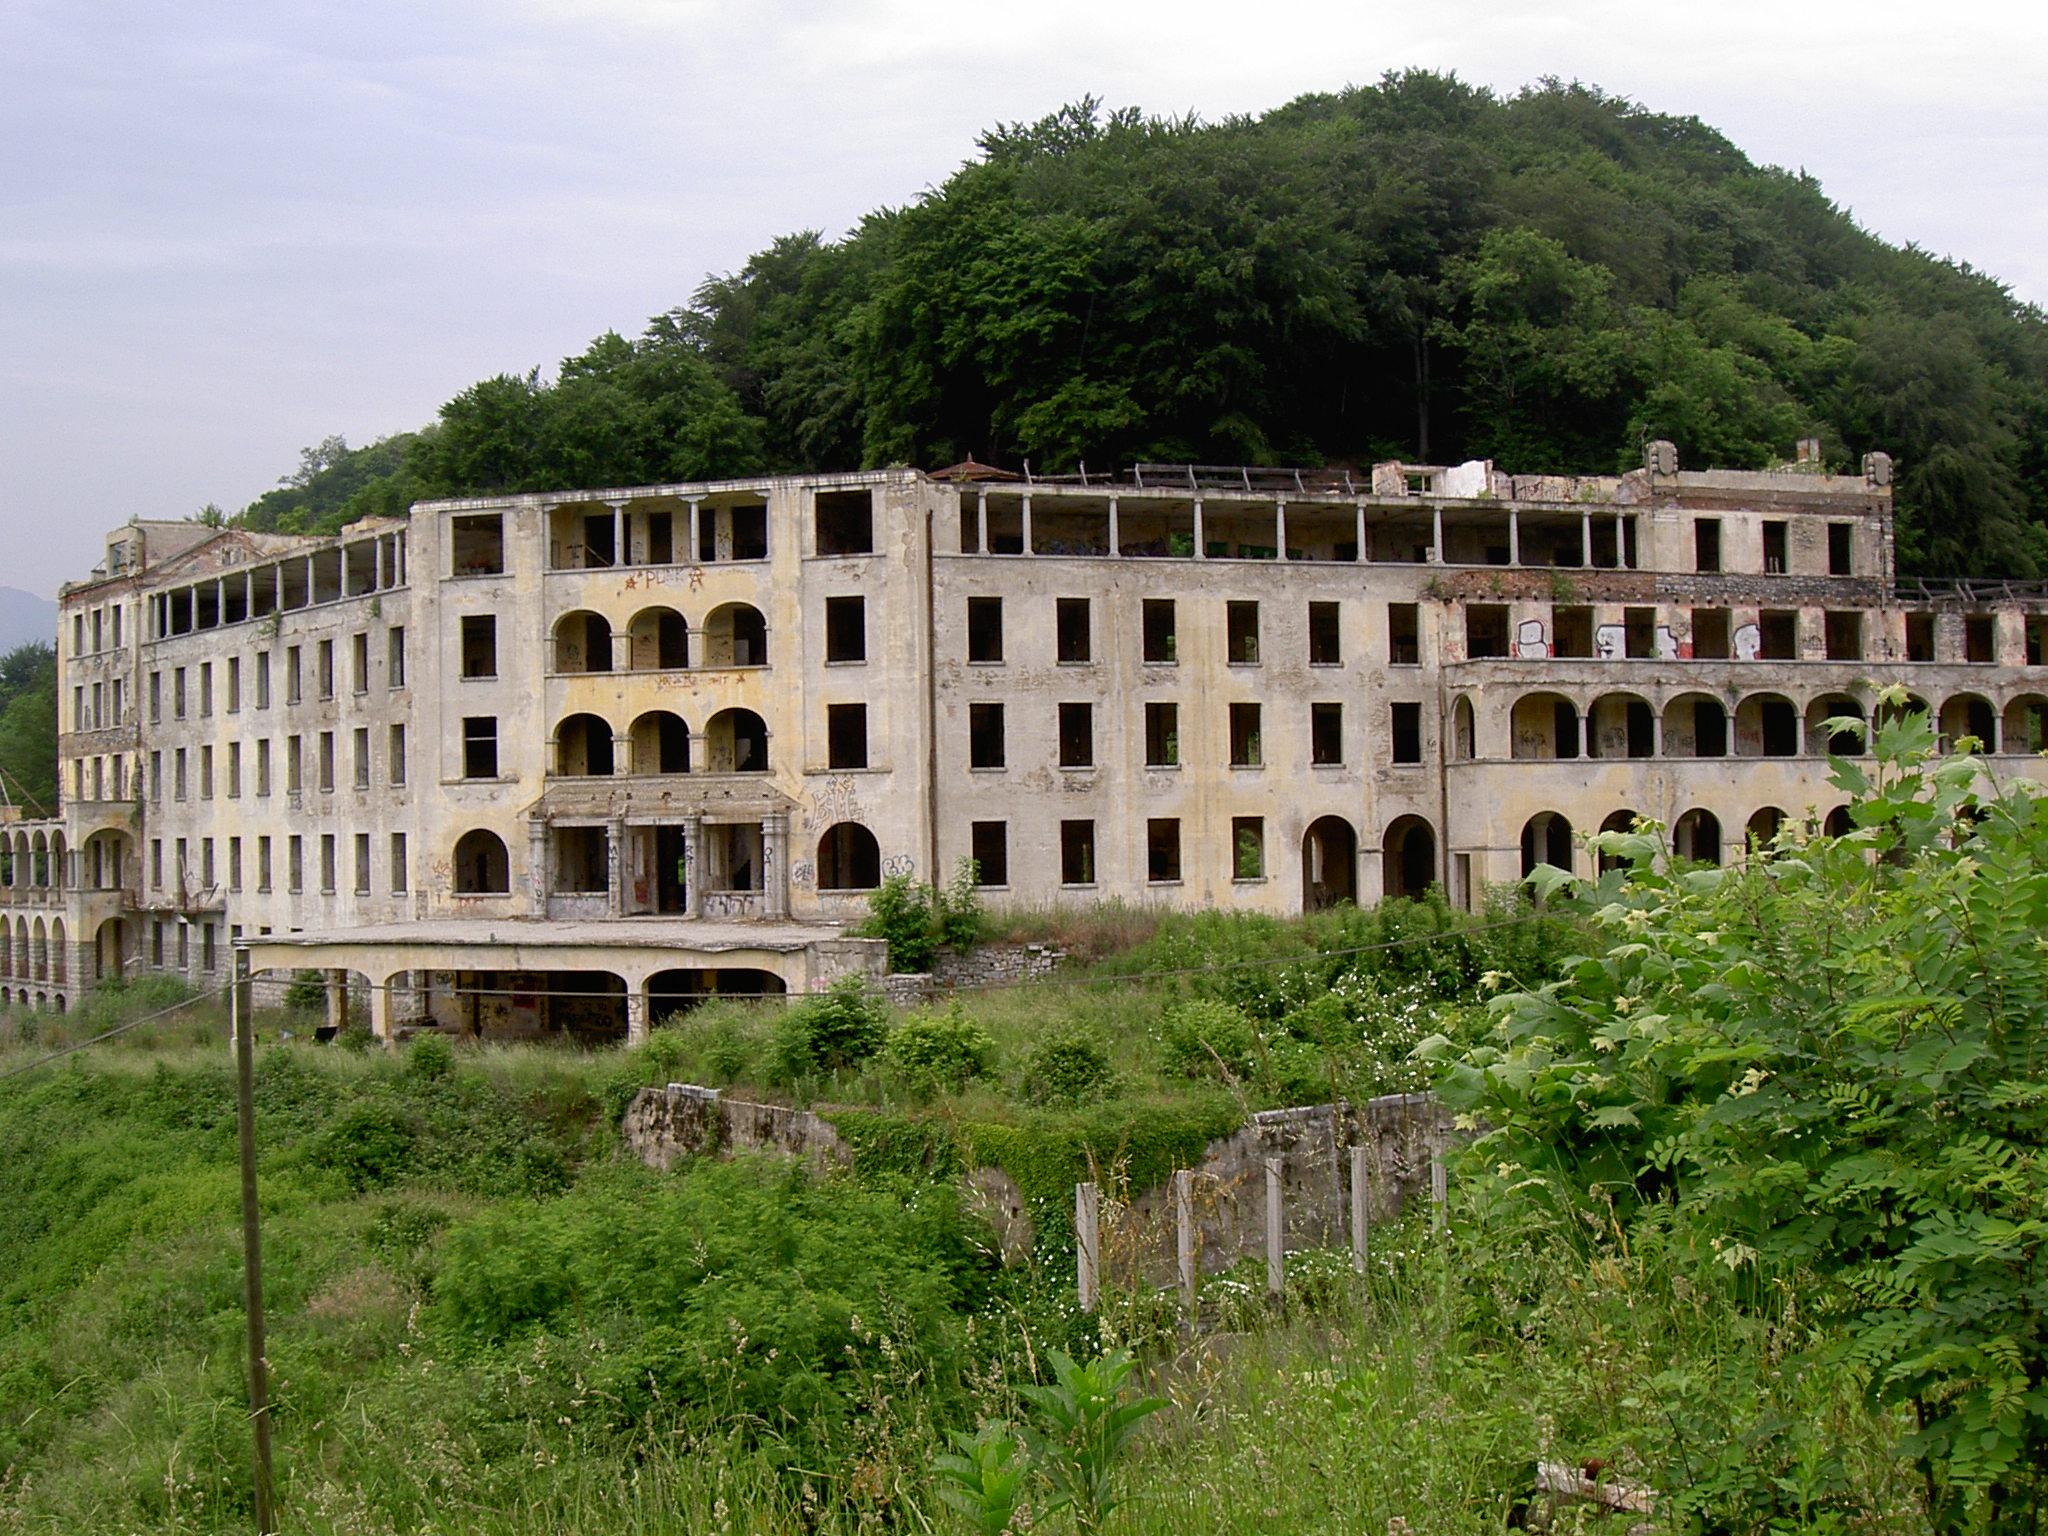 Hotel Villa Resort  Pieve A Nievole Pt